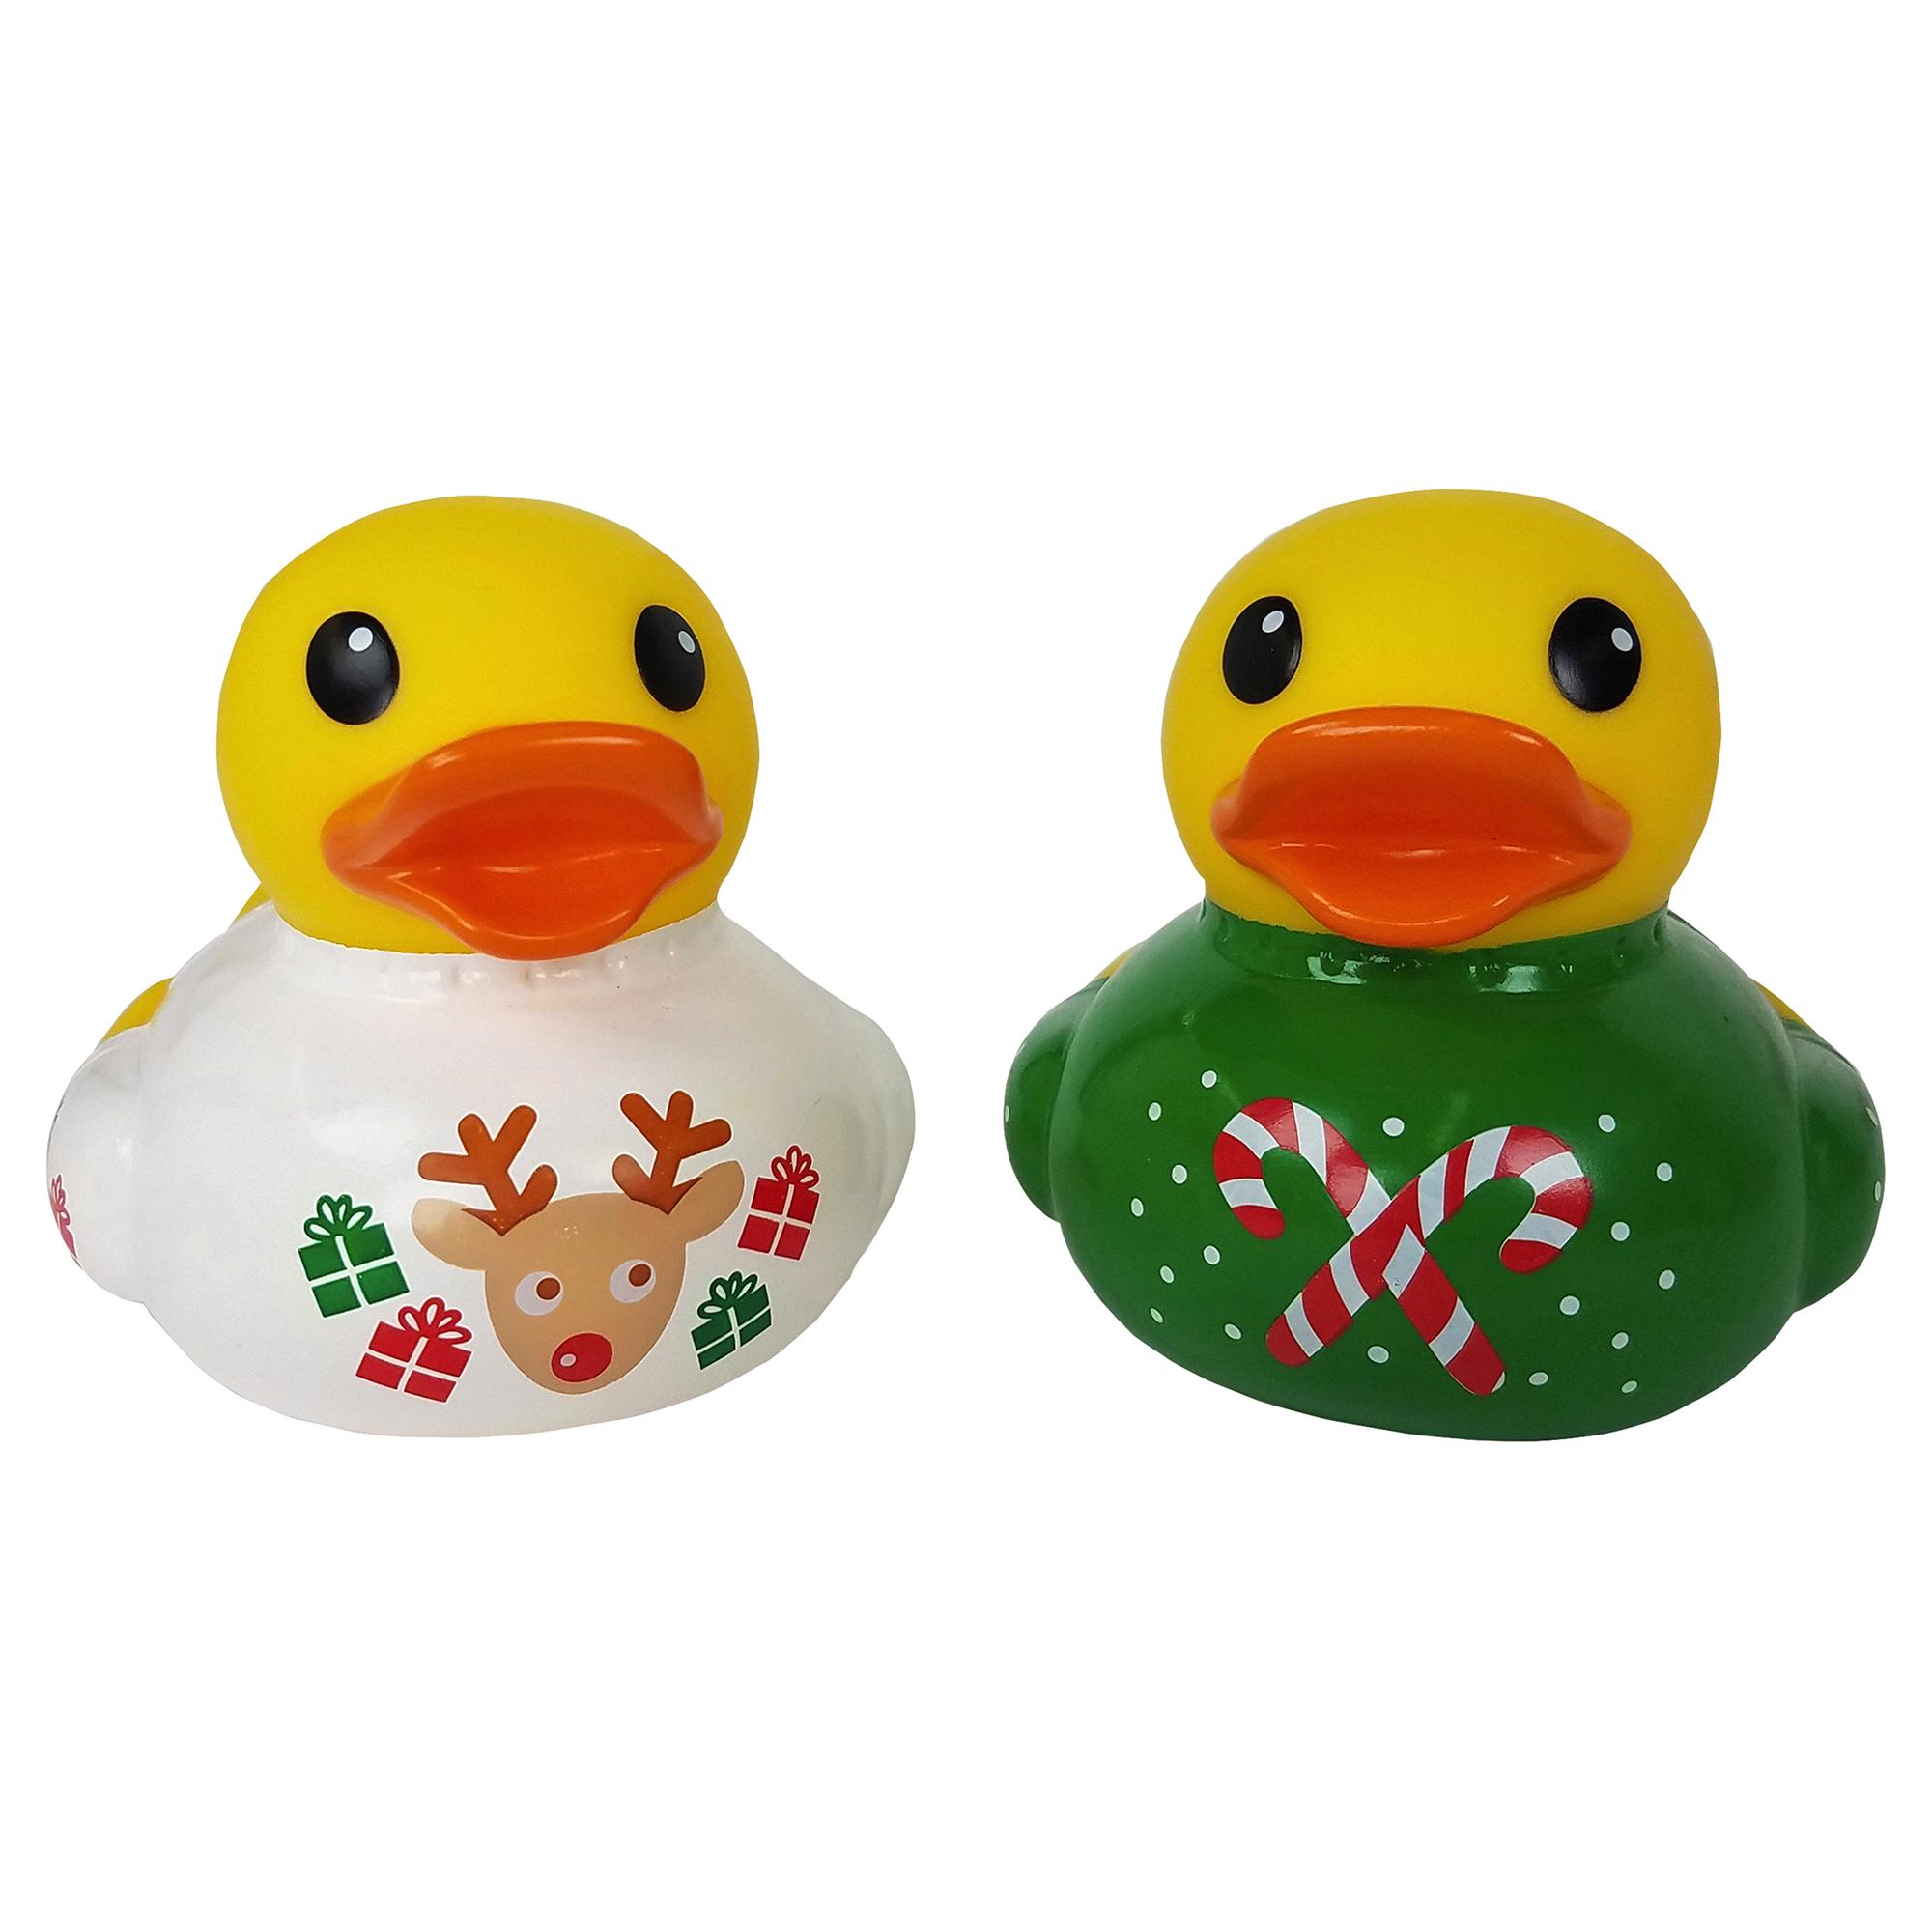 Infantino Holiday Duck | Meijer.com